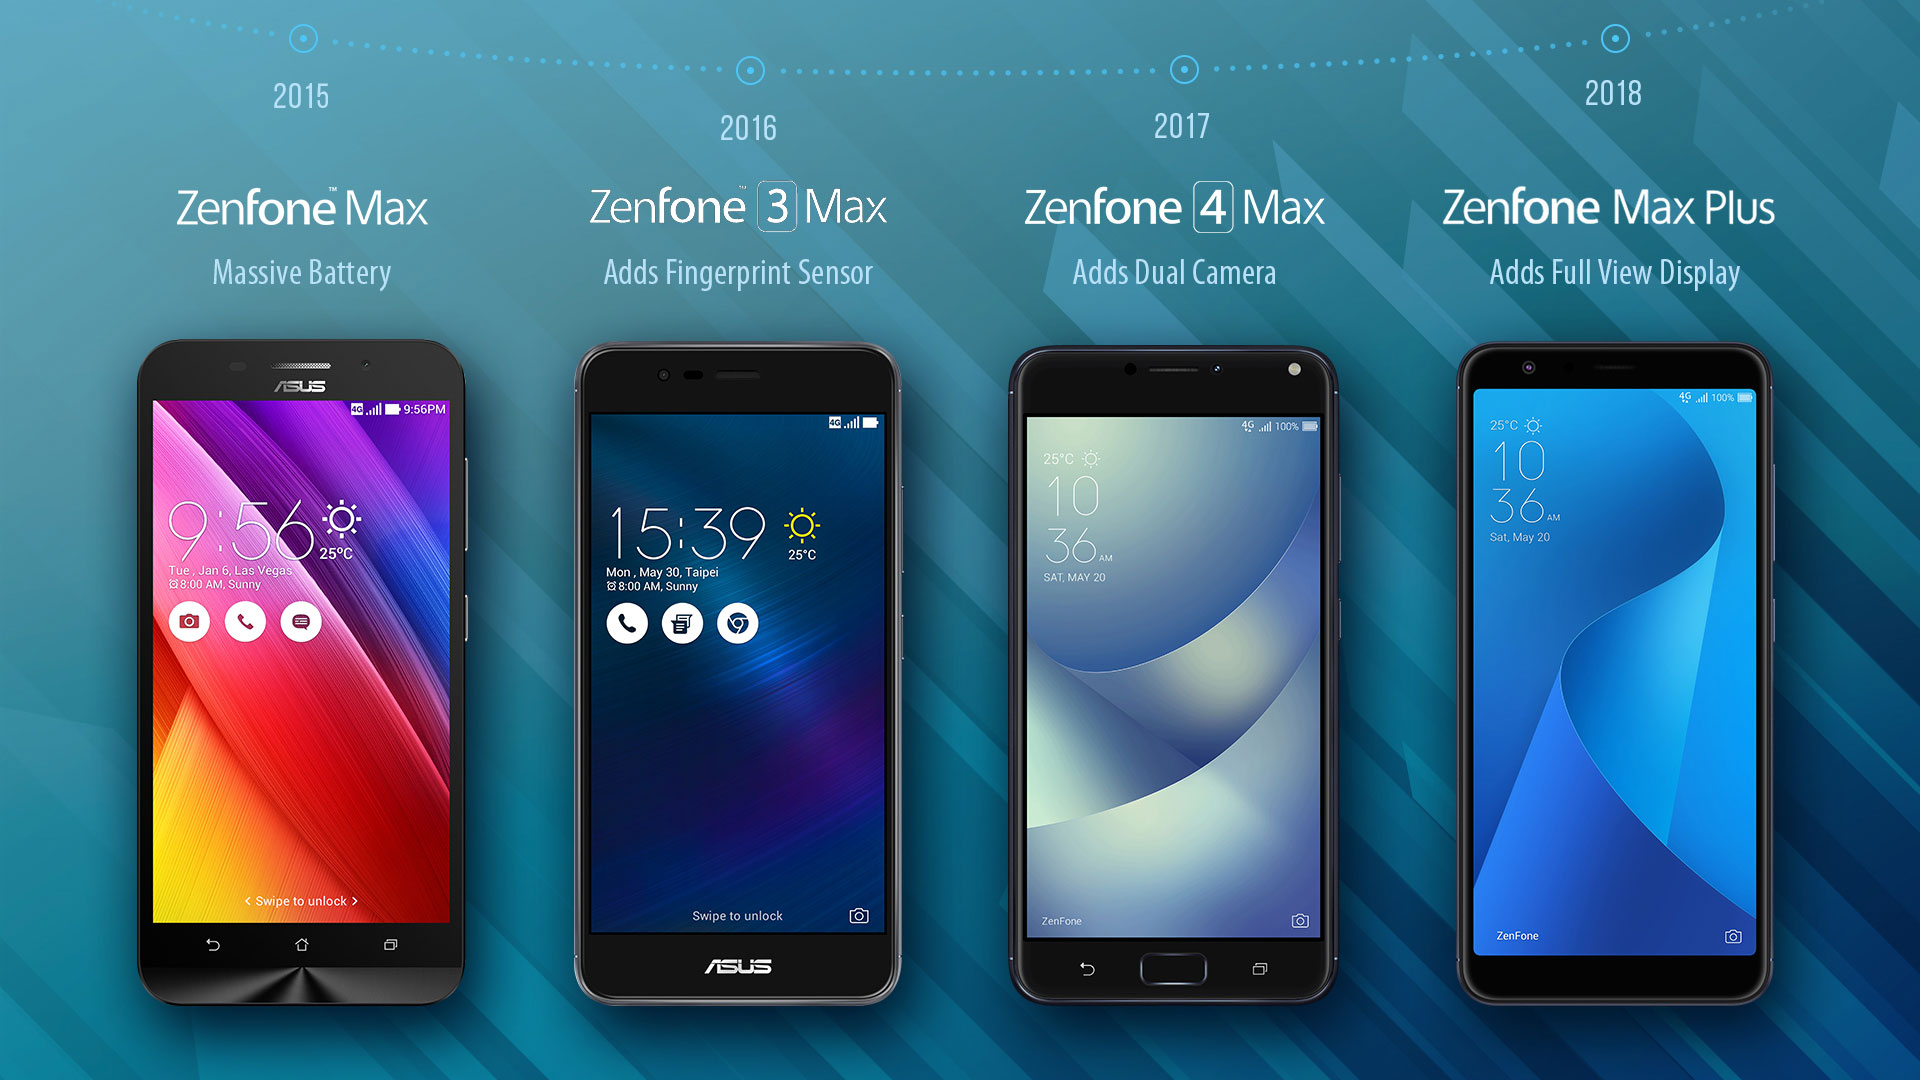 ZenFone Max bezel progression